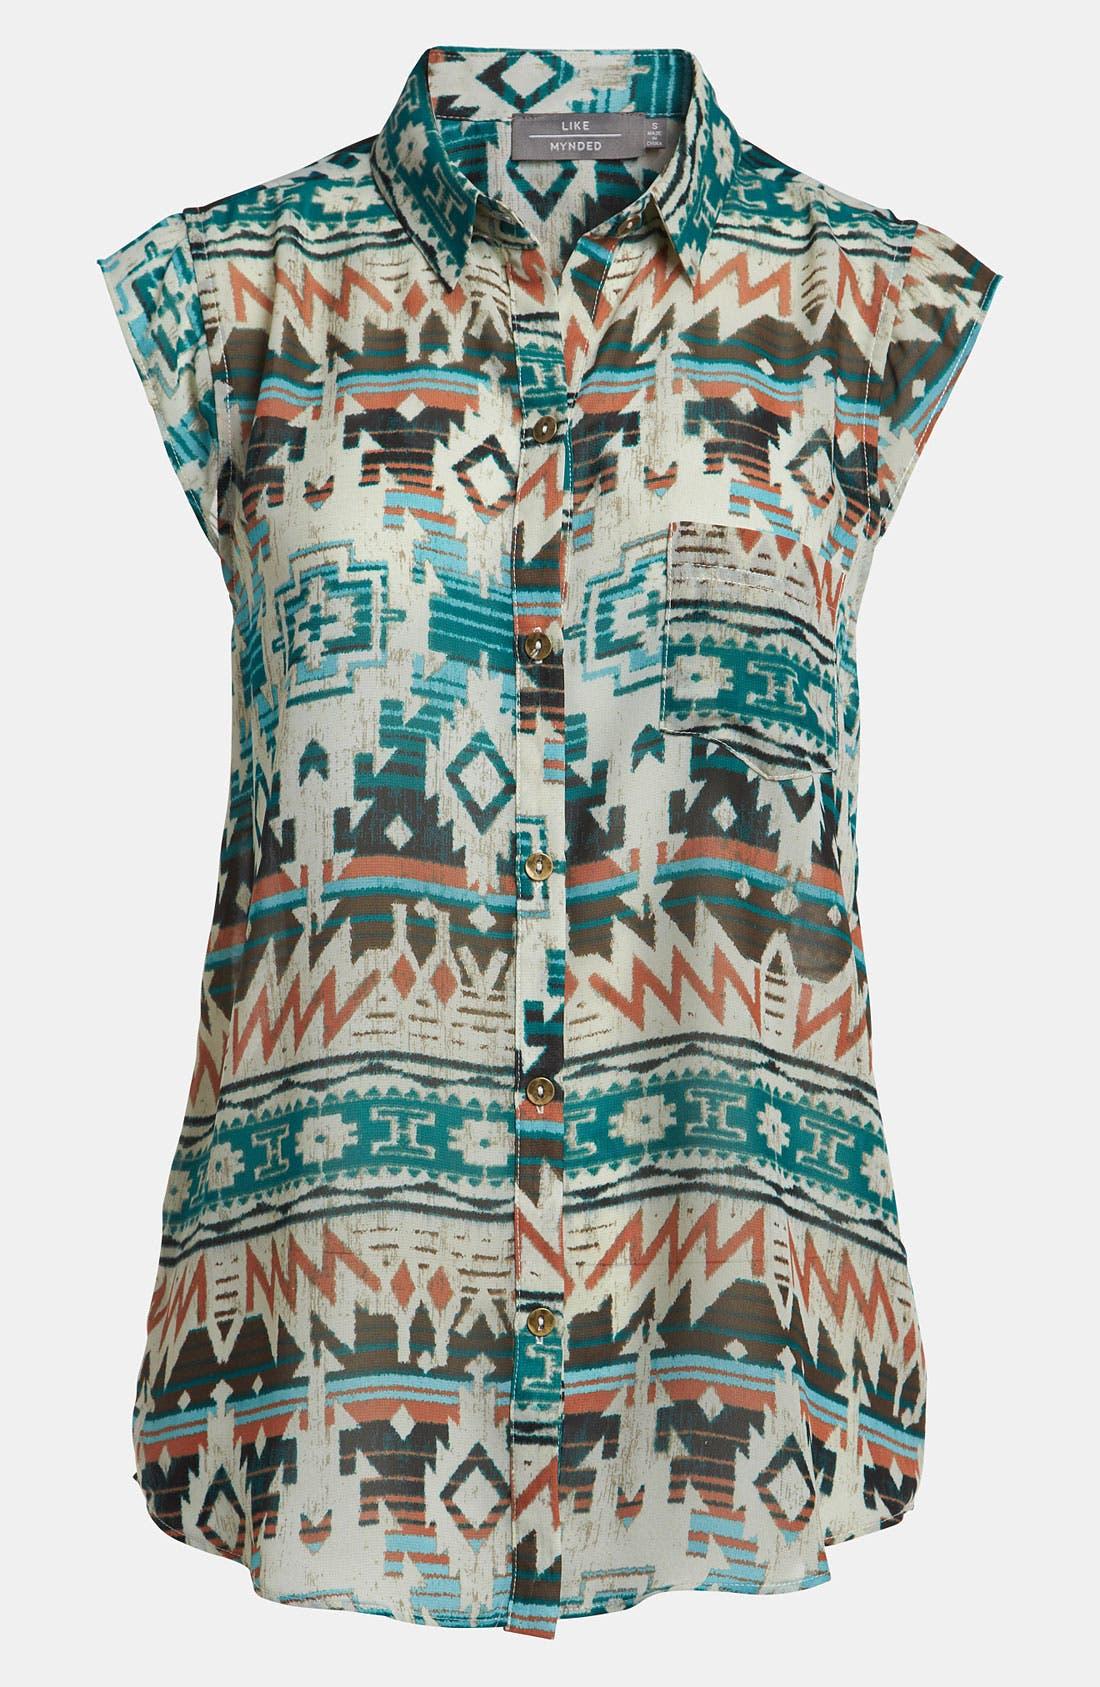 Alternate Image 1 Selected - Like Mynded Aztec Print Sleeveless Shirt